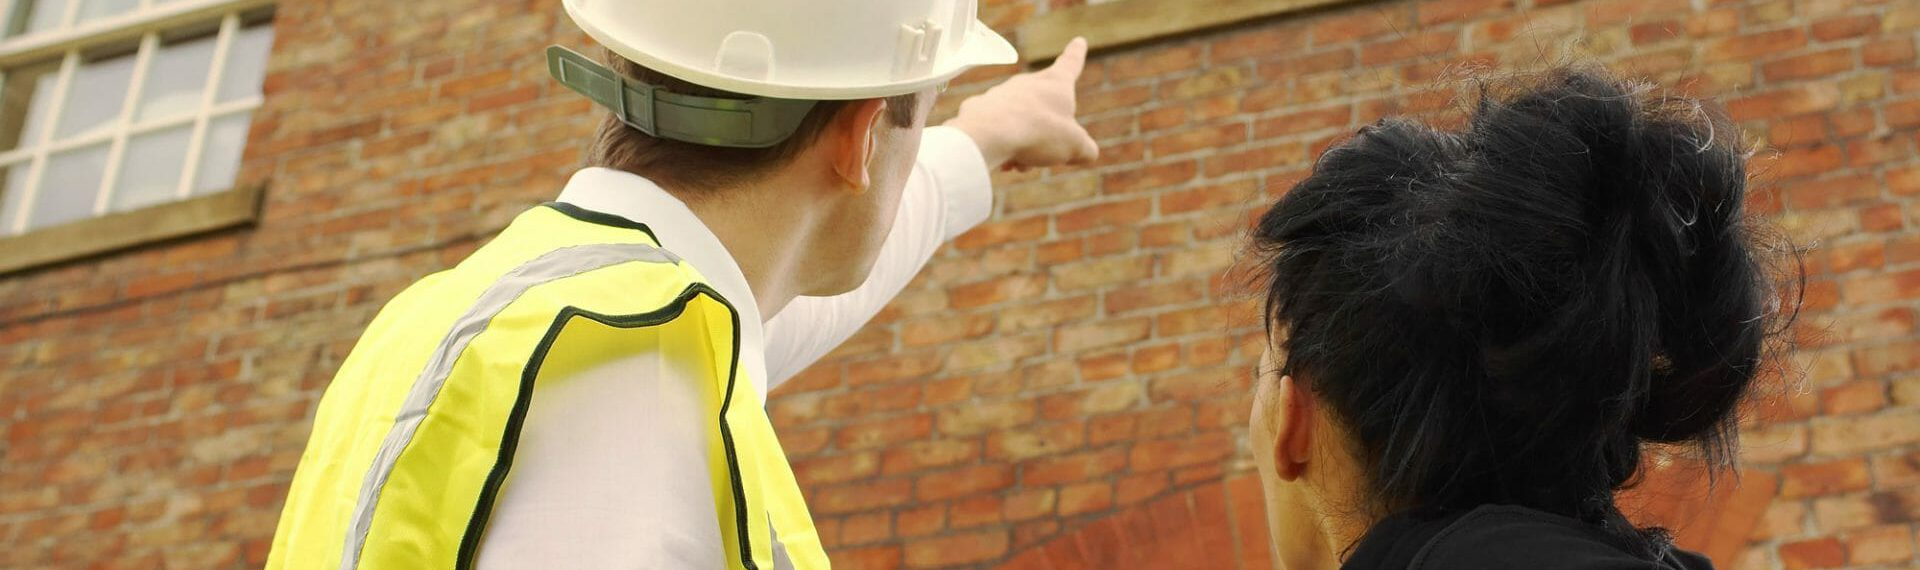 property maintenance expert advising customer